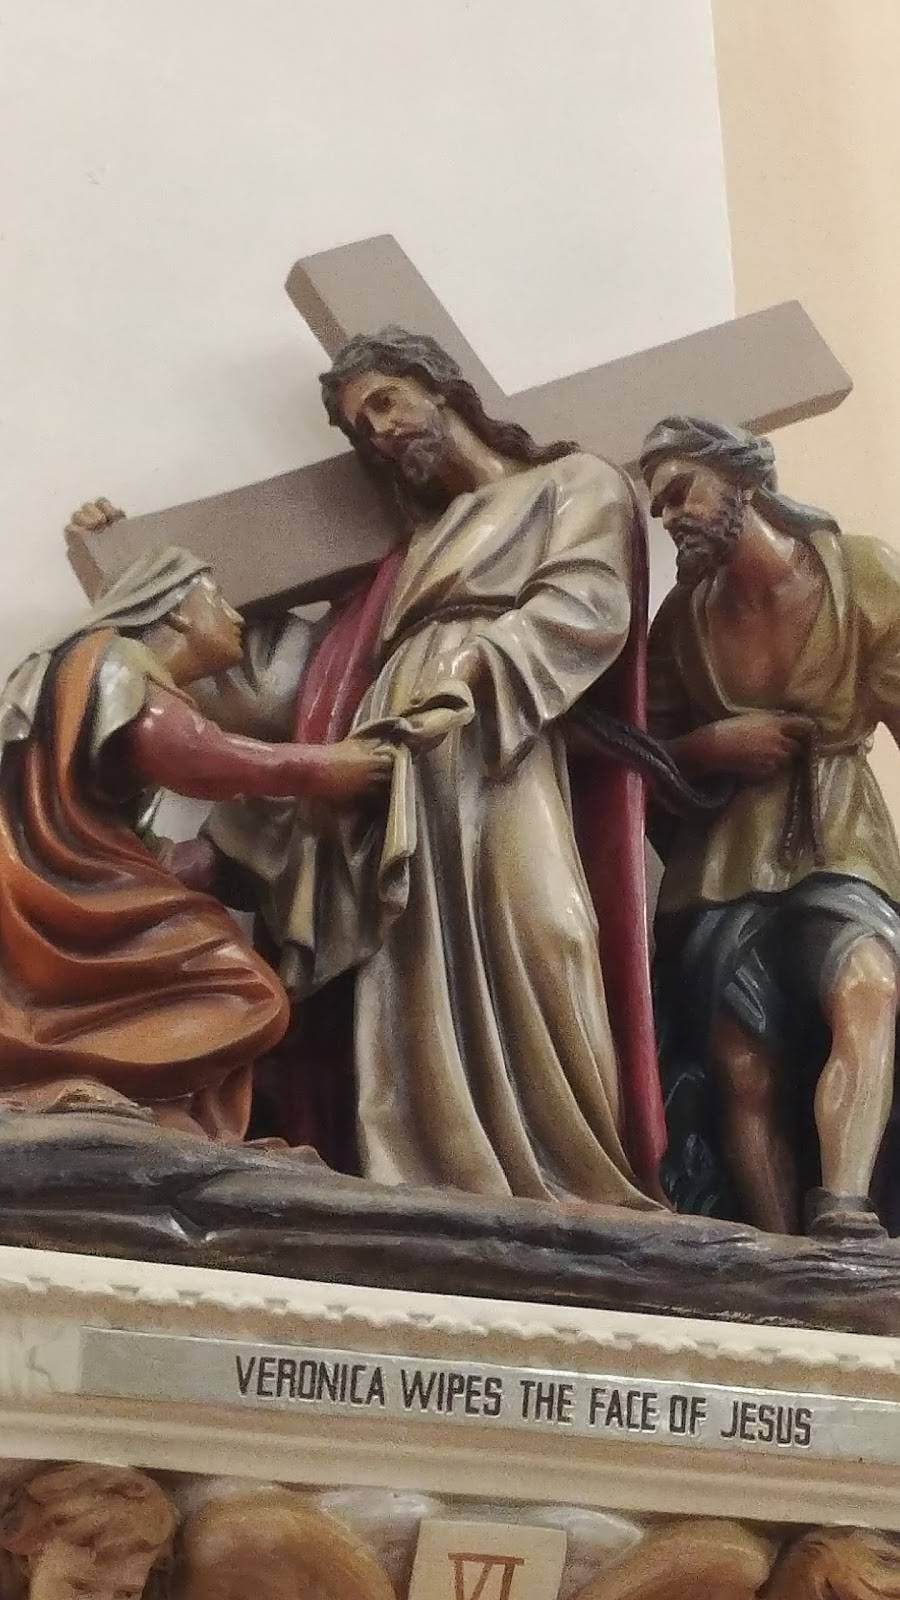 St Mary Church - church  | Photo 3 of 6 | Address: 210 Garnier St, Pittsburgh, PA 15215, USA | Phone: (412) 784-8700